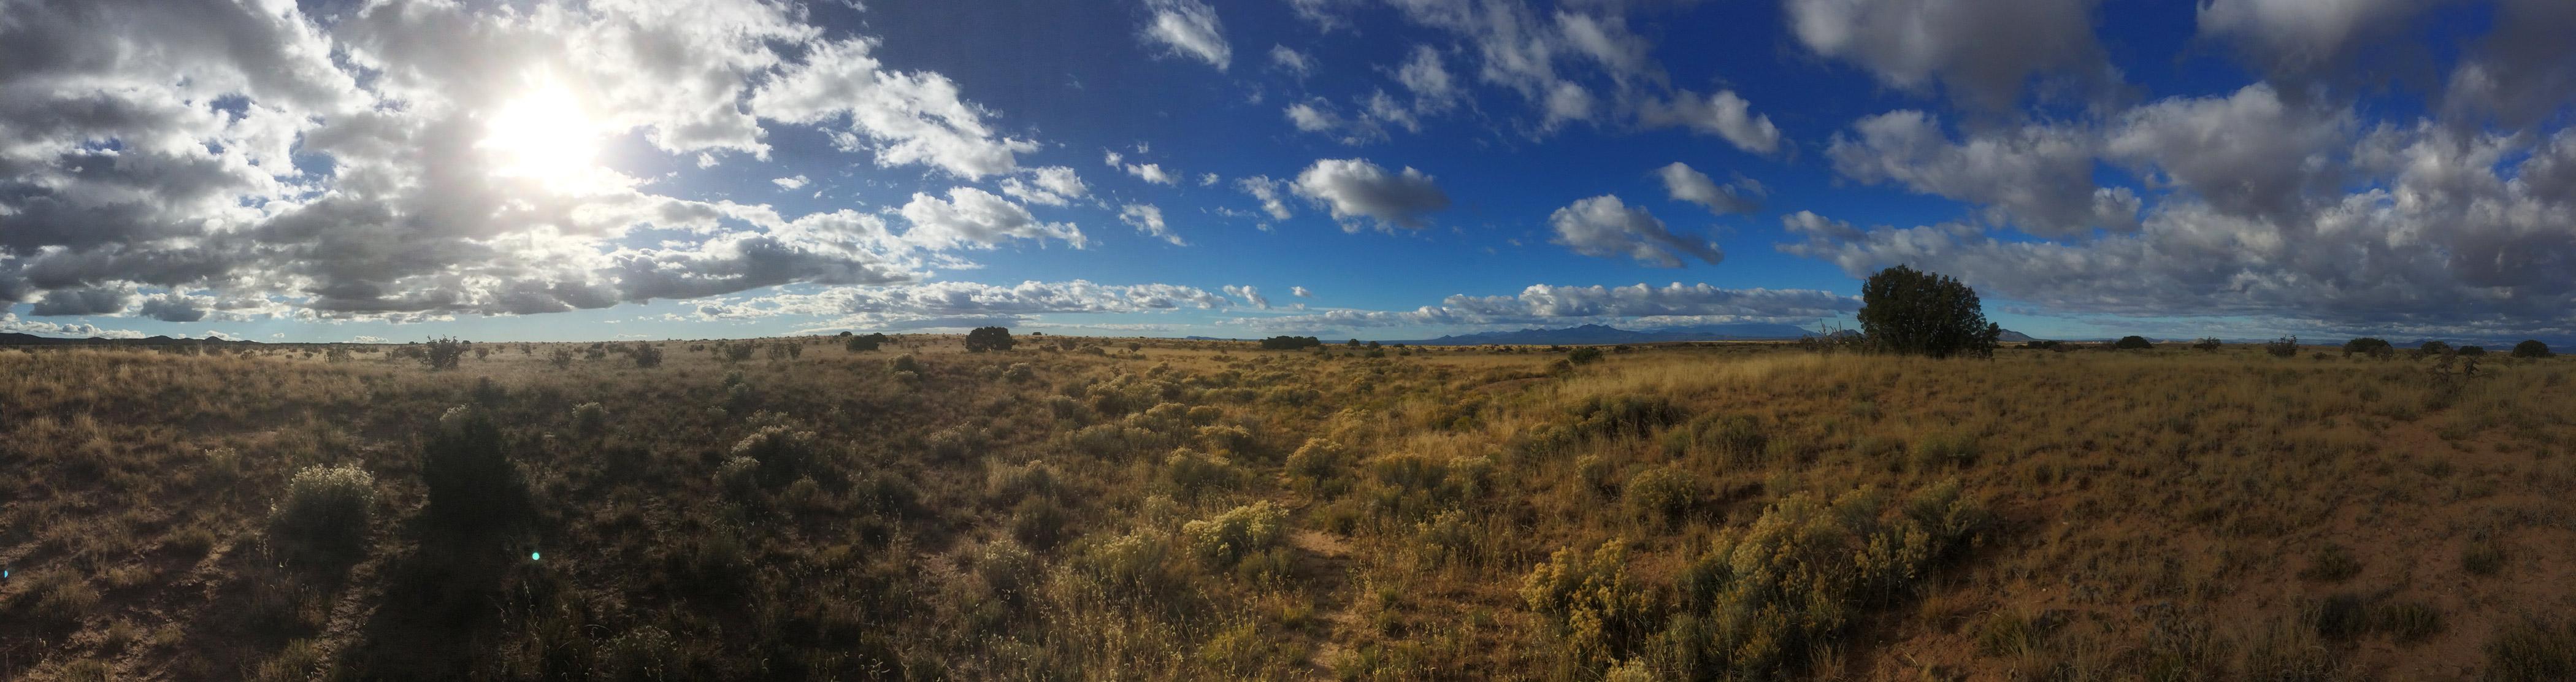 ranch panoramic